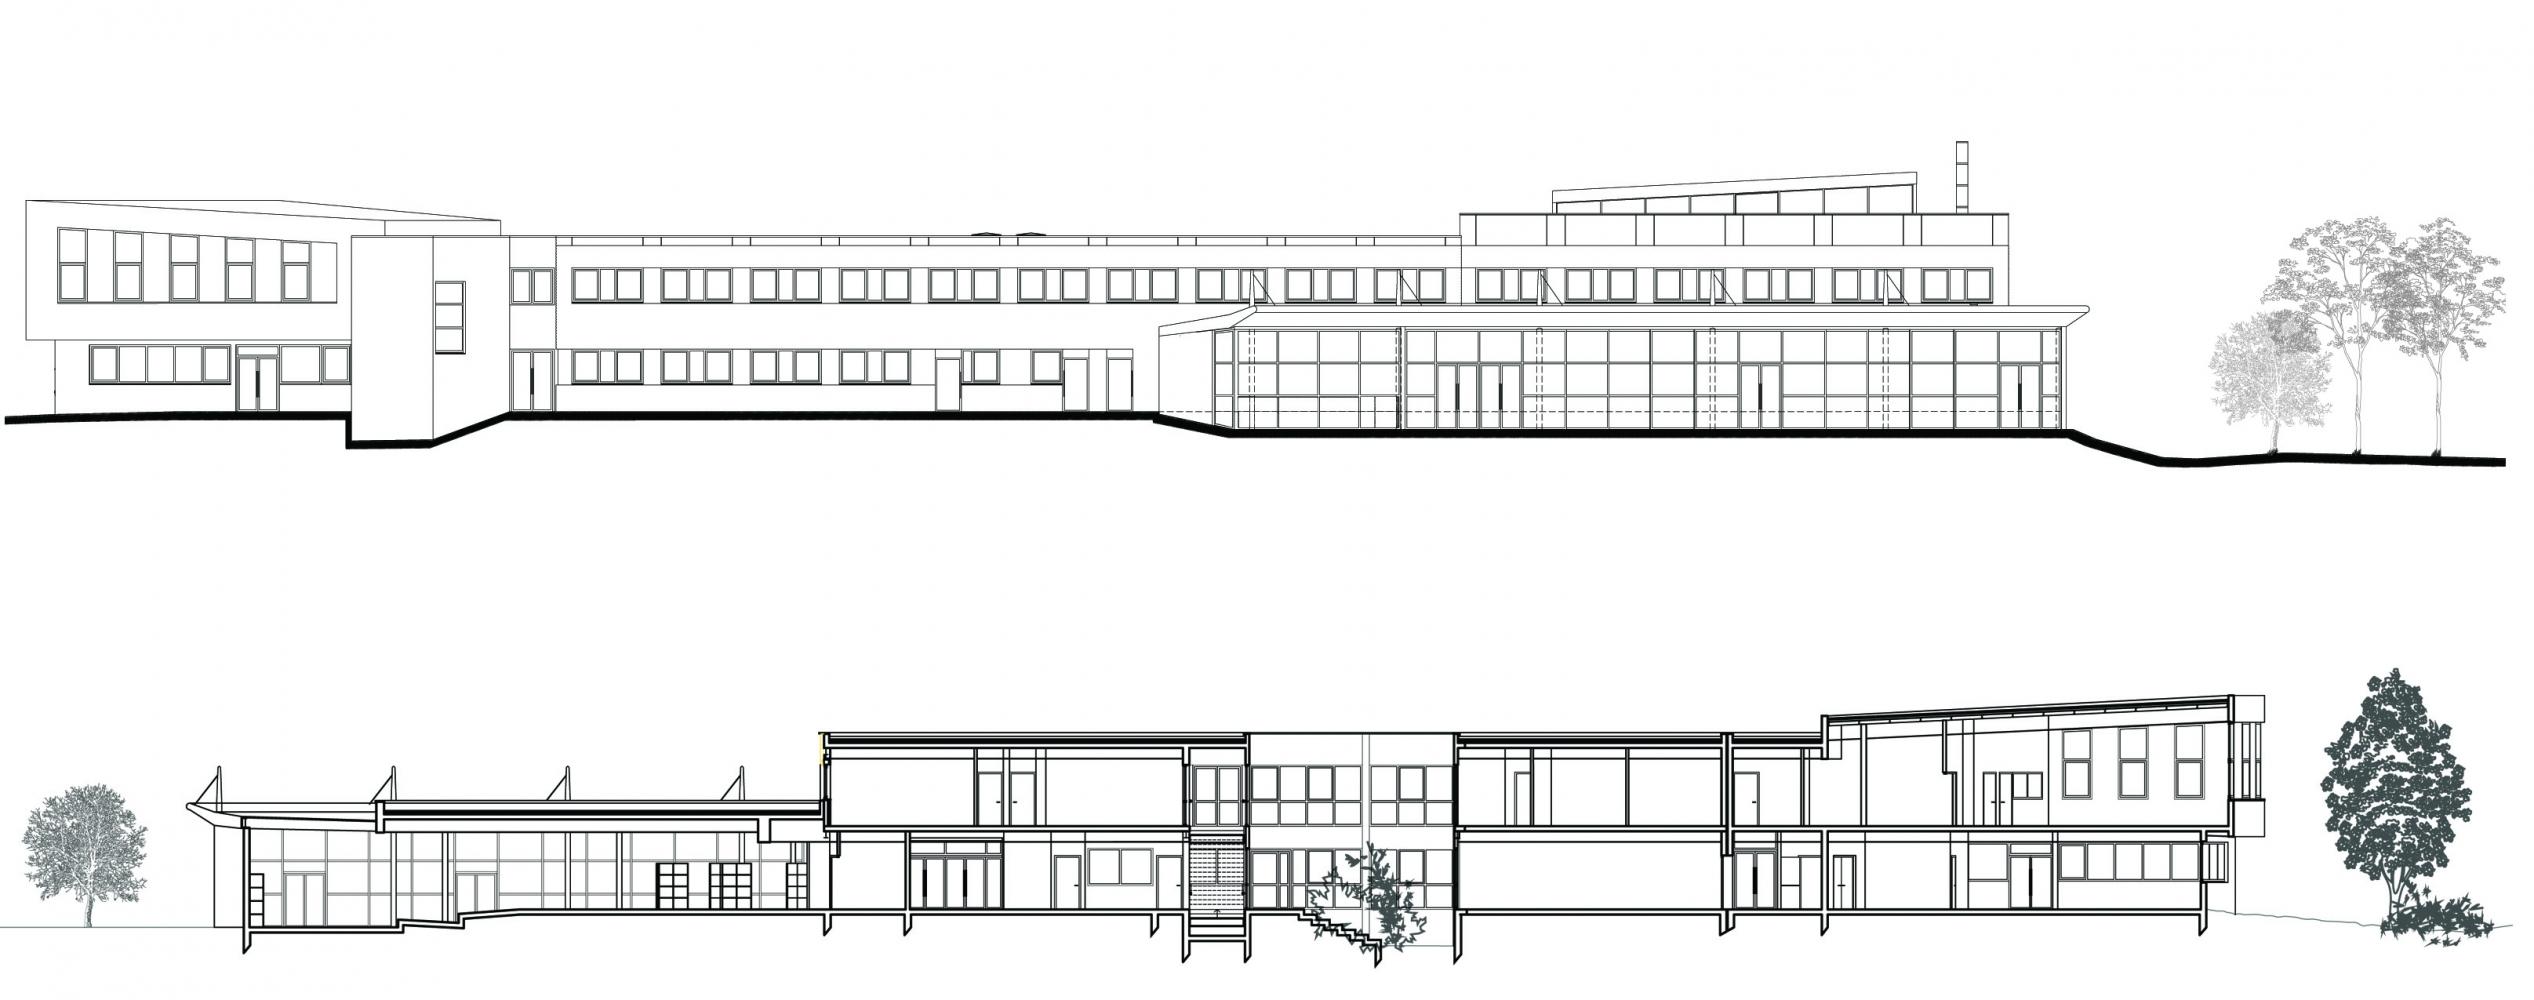 zligu---16 Pascale SEURIN Architecte - Pascale SEURIN Architecte